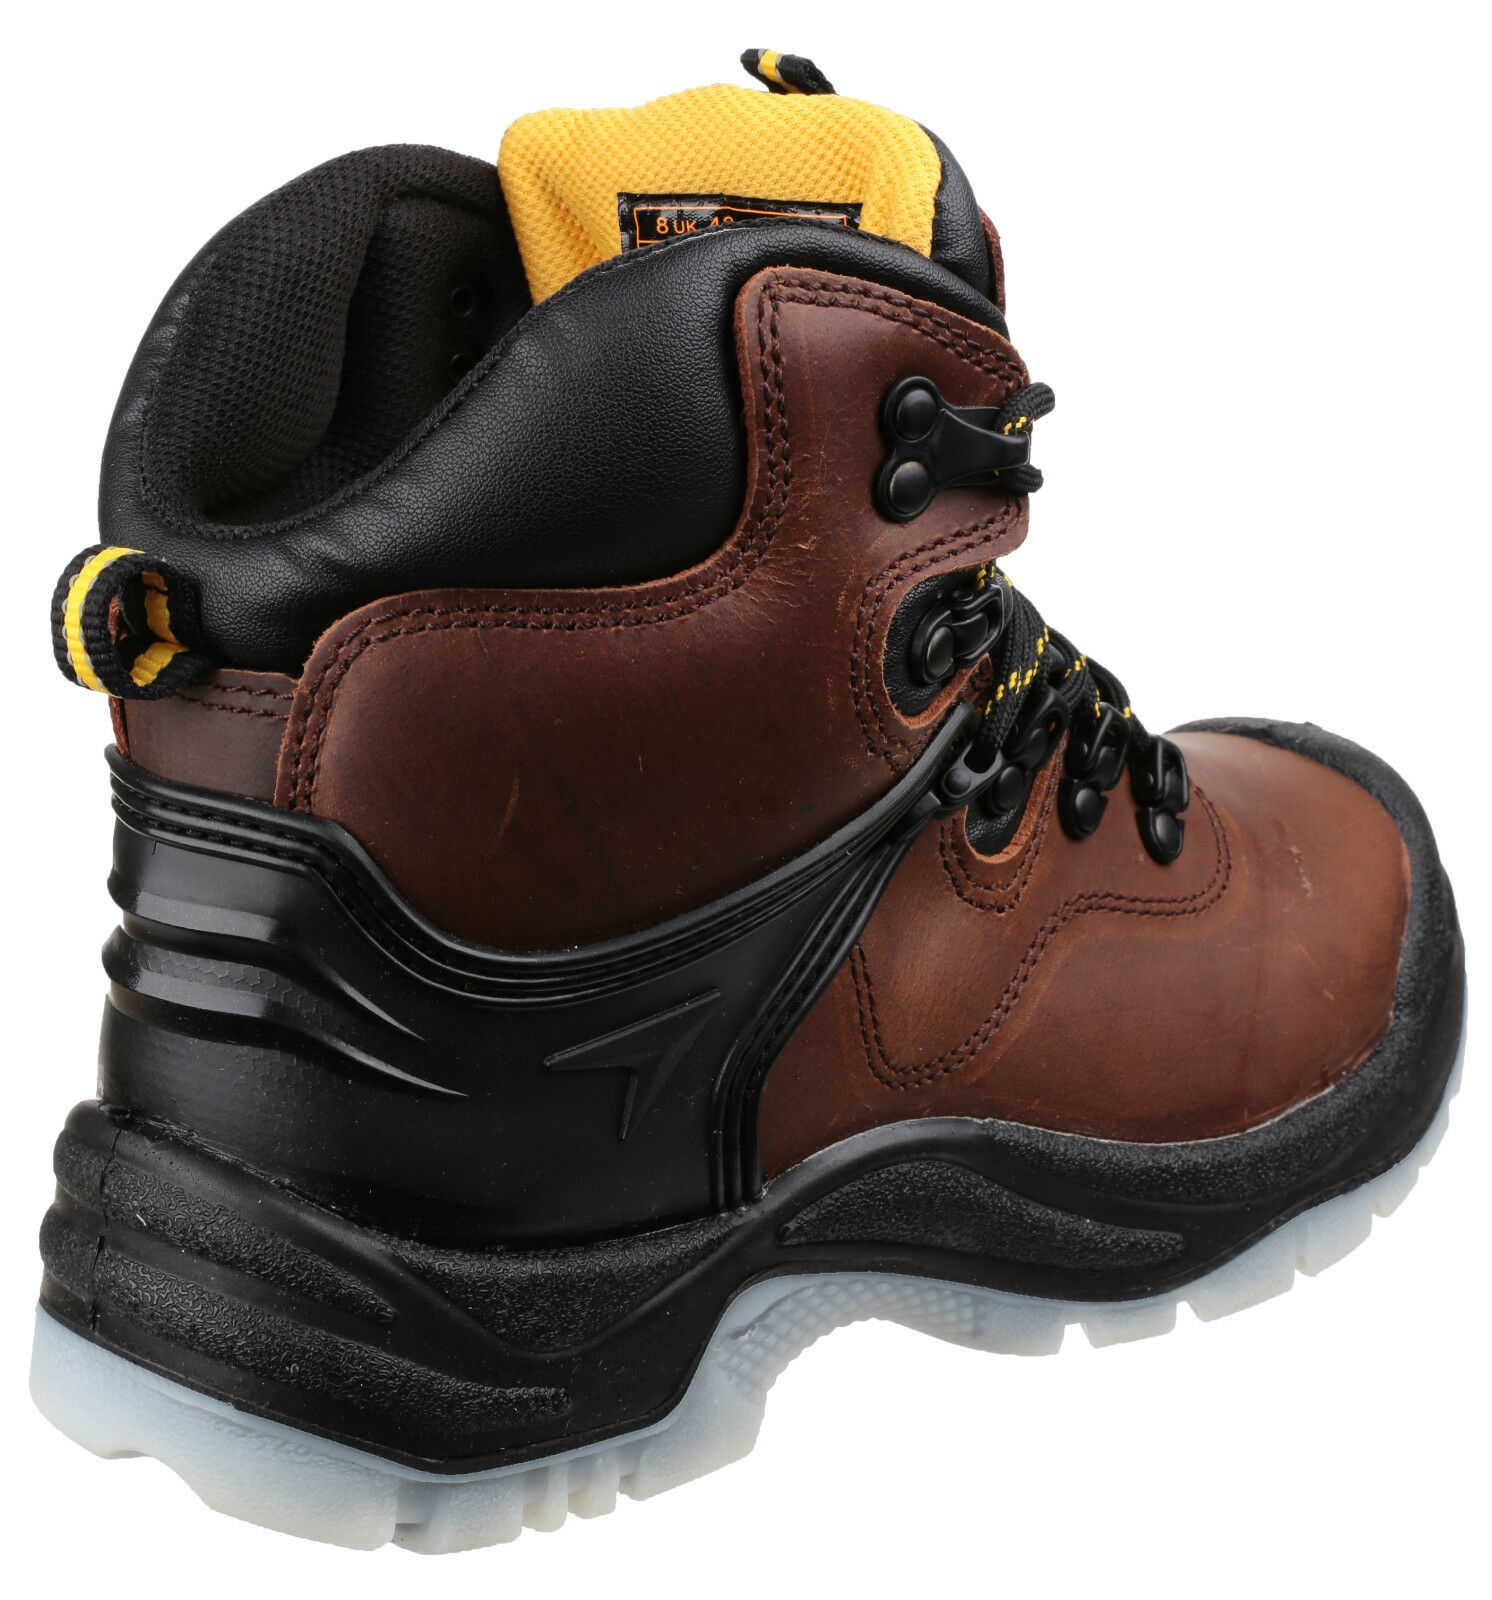 Amblers FS197 Waterproof Safety Boots Mens Brown Steel Toe Cap Shoes UK4-14